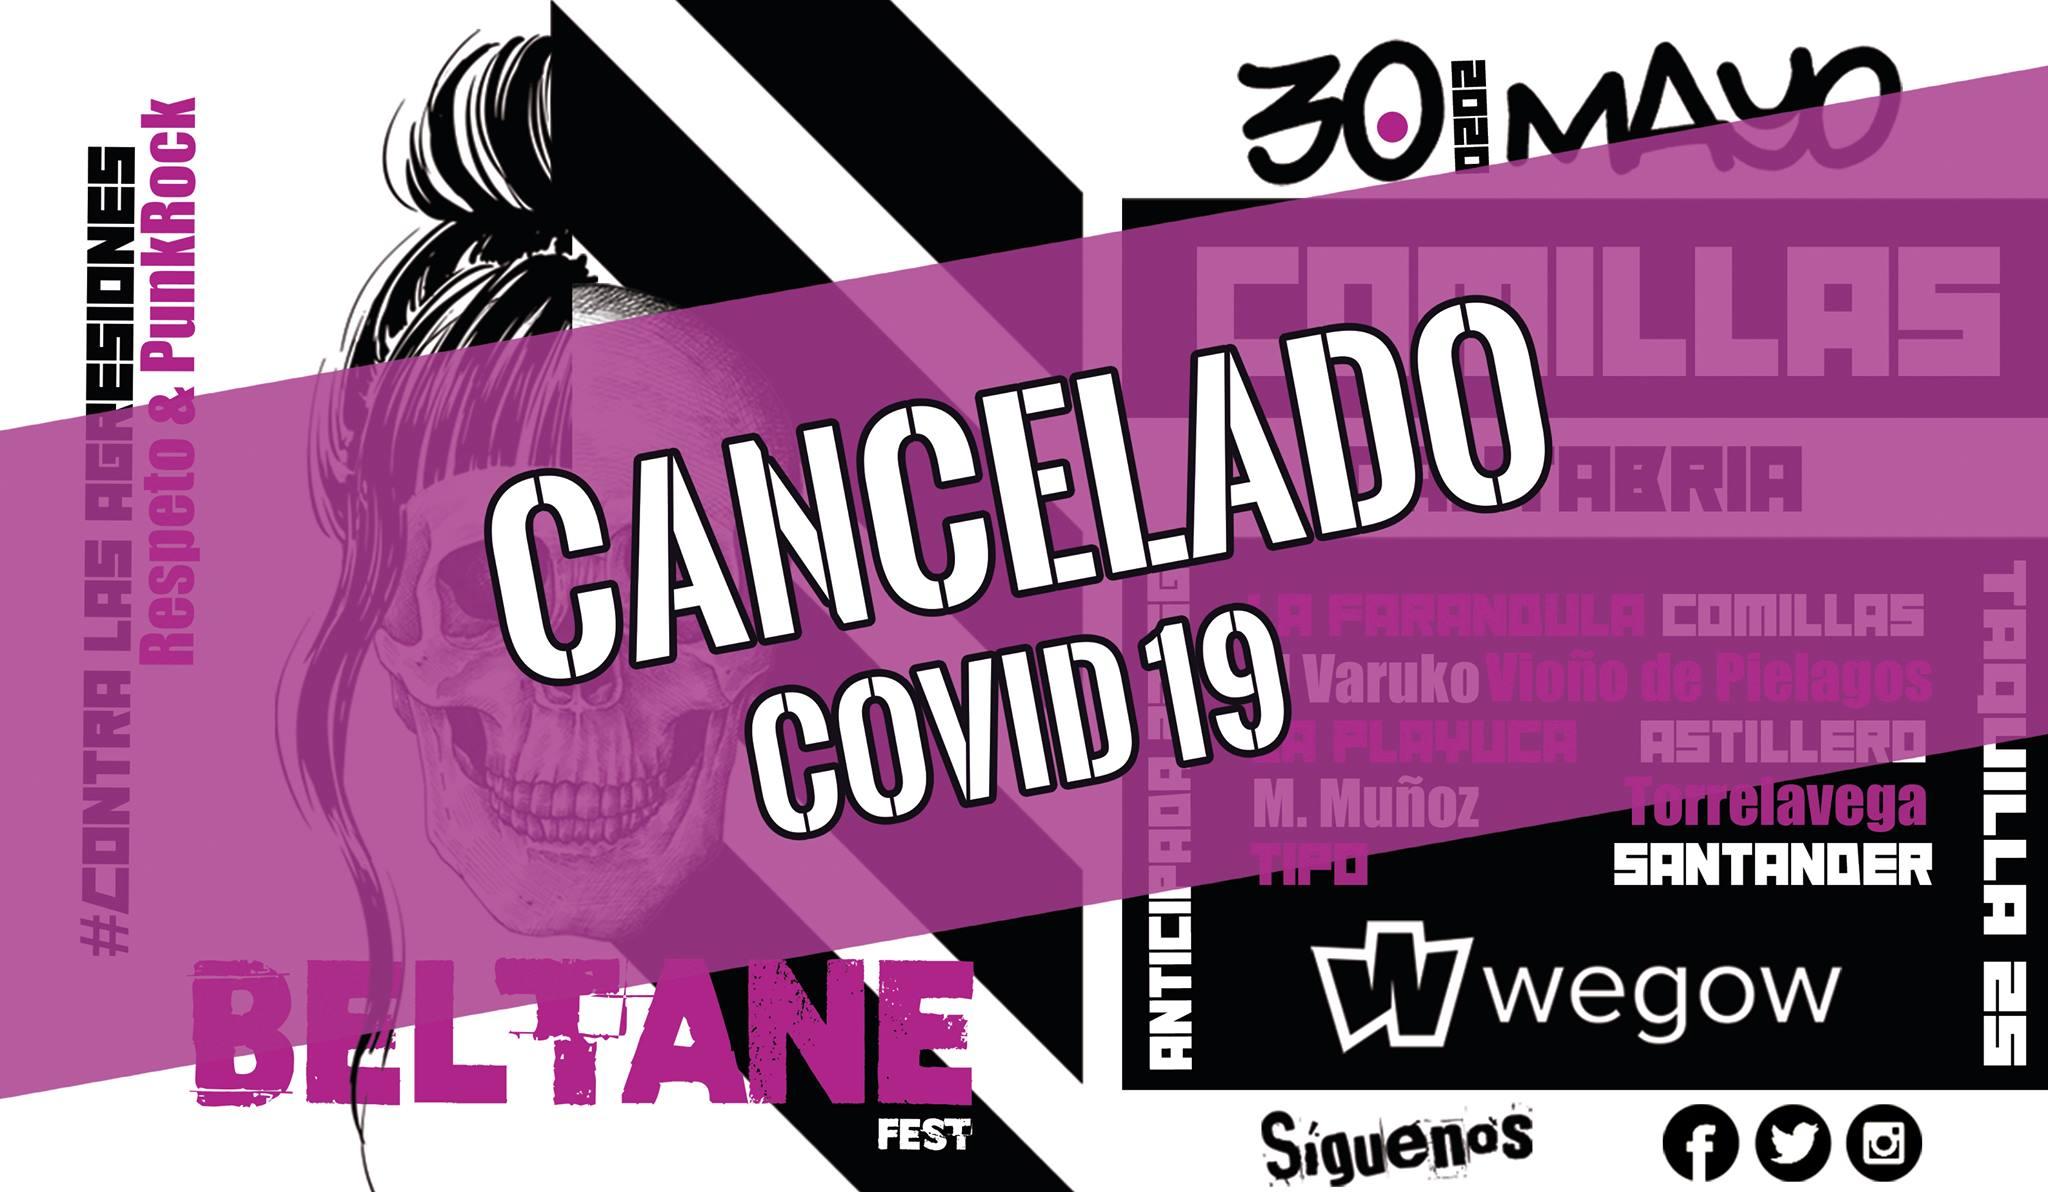 Se cancela el Beltane Fest 2020 - Comillas (Cantabria)